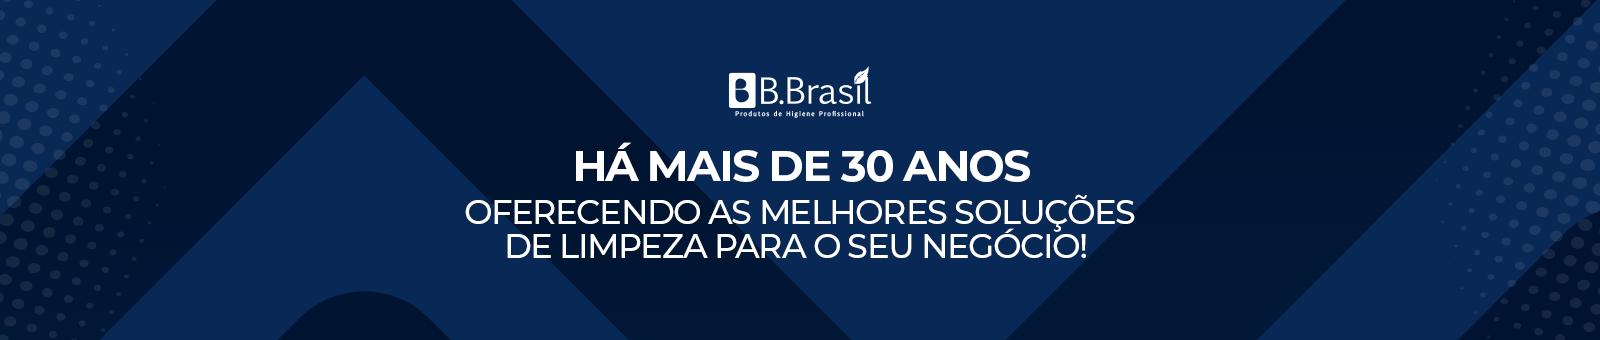 B.Brasil - Banners para o site 30